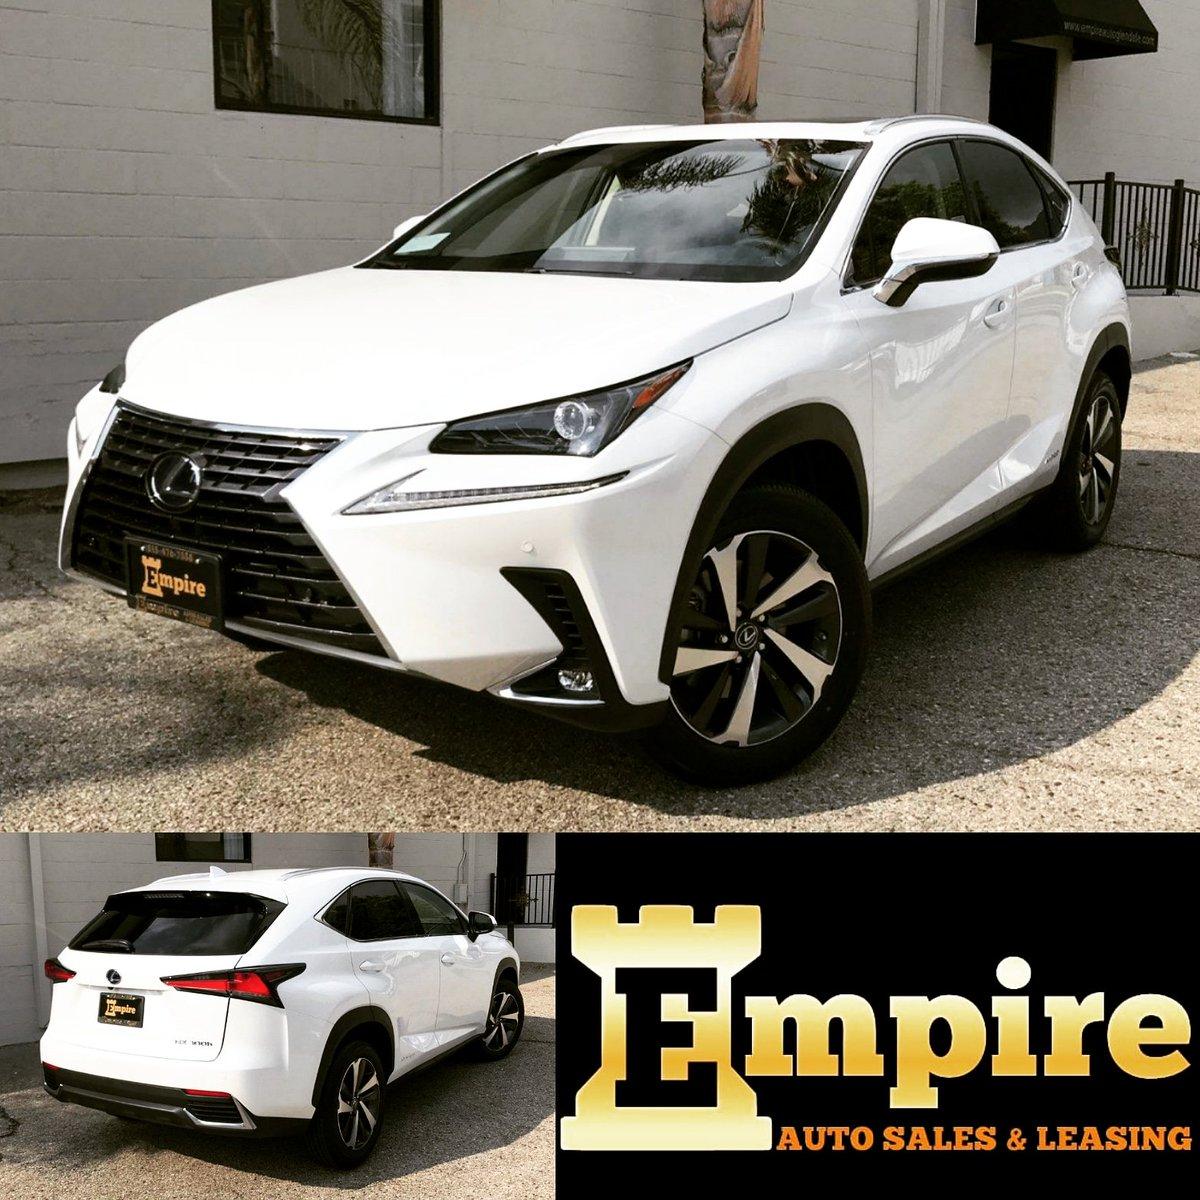 Empire Auto Sales >> Empire Auto Sales A Twitter 2019 Lexus Nx300 Hybrid White Black